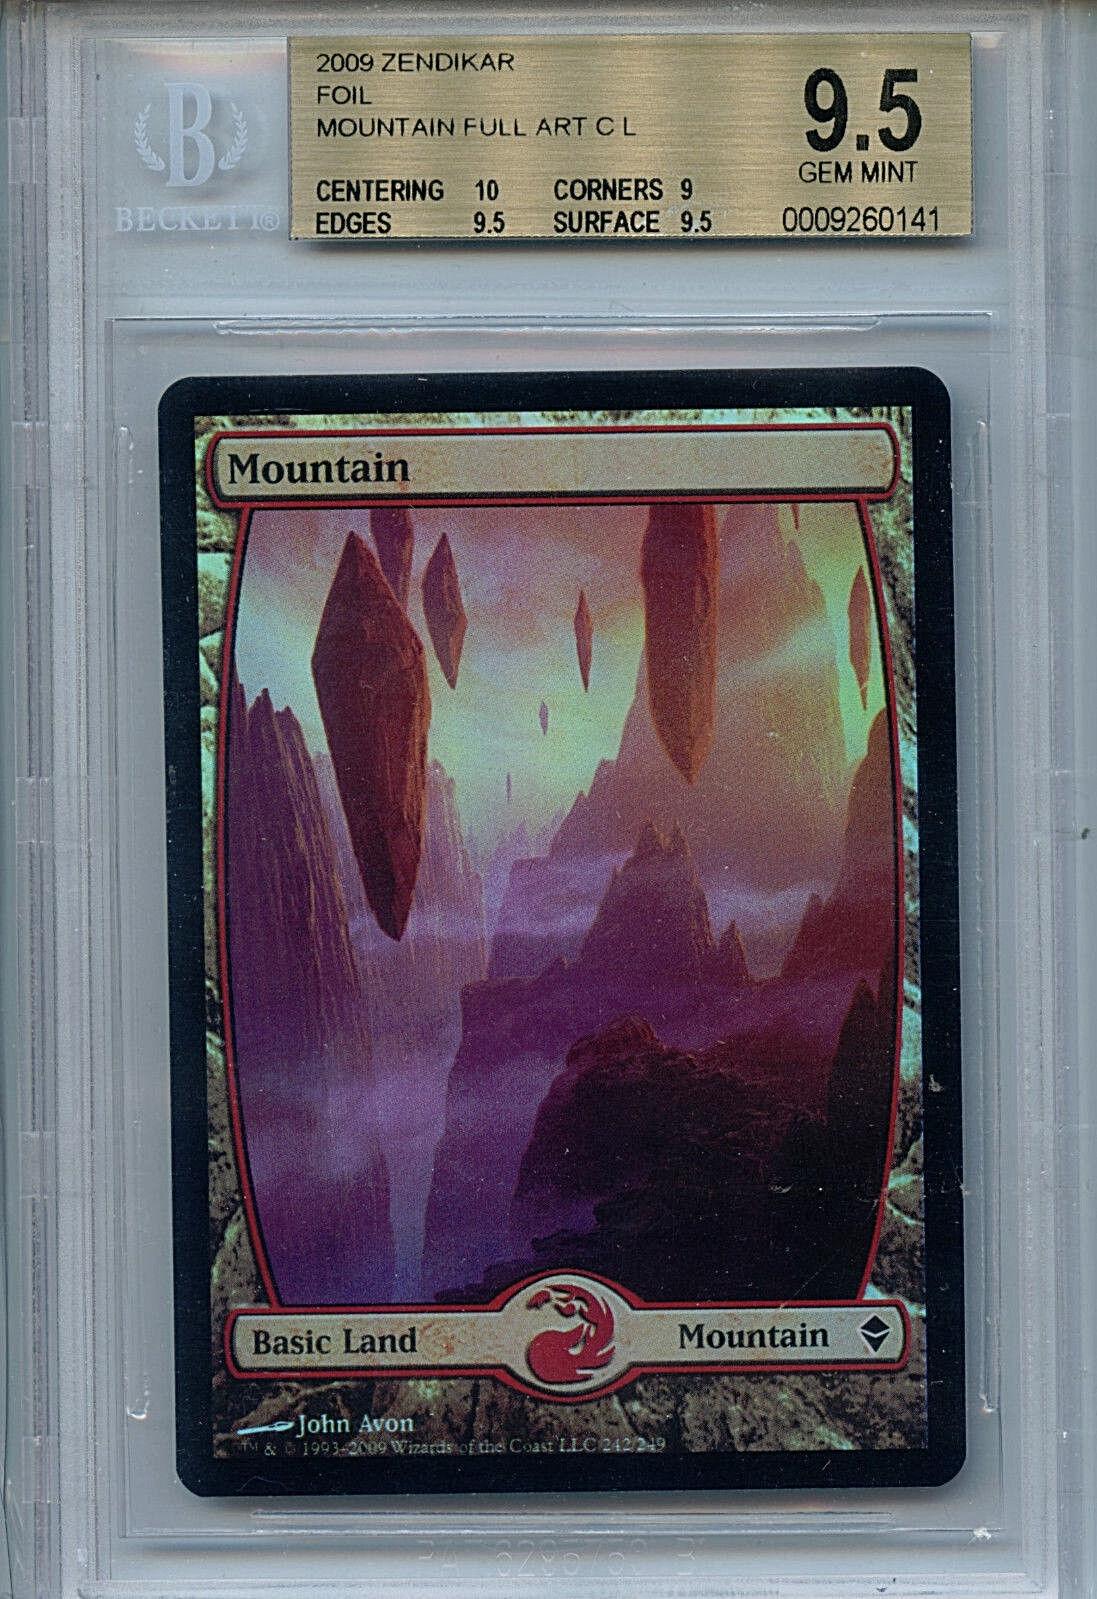 MTG MTG MTG Mountain BGS 9.5 Gem Mint Zendikar Foil Full Art Card Amricons 0141 0a785b